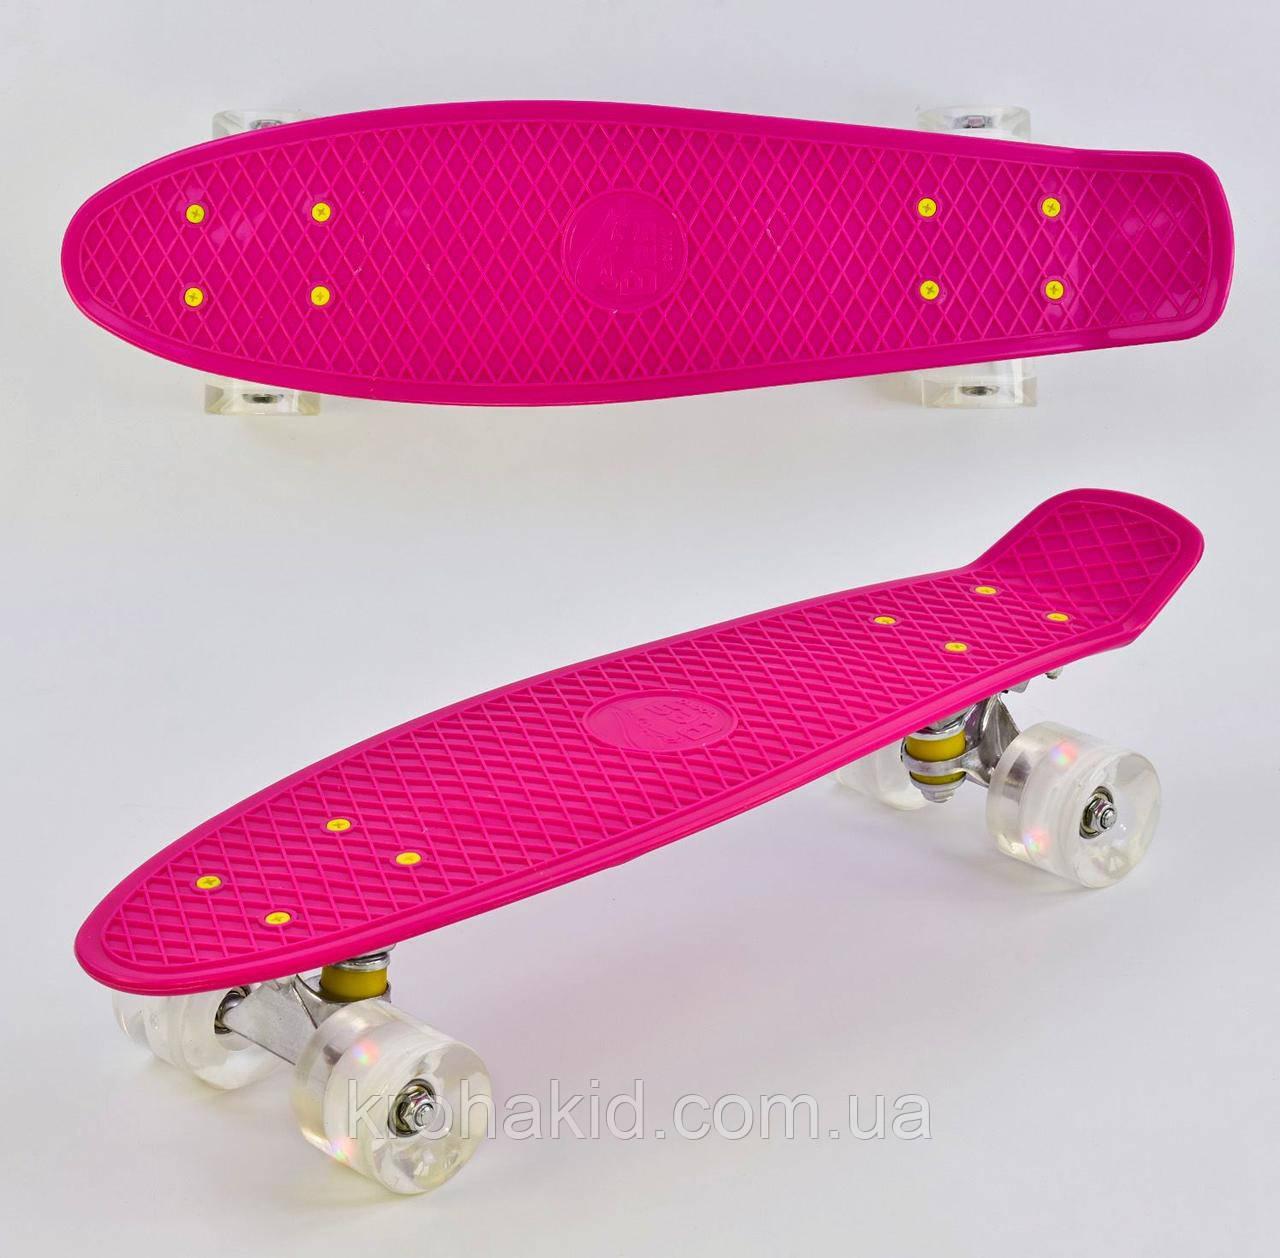 Скейт Пенни борд 9090 Best Board, МАЛИНОВЫЙ, СВЕТ, доска=55см, колёса PU d=6см